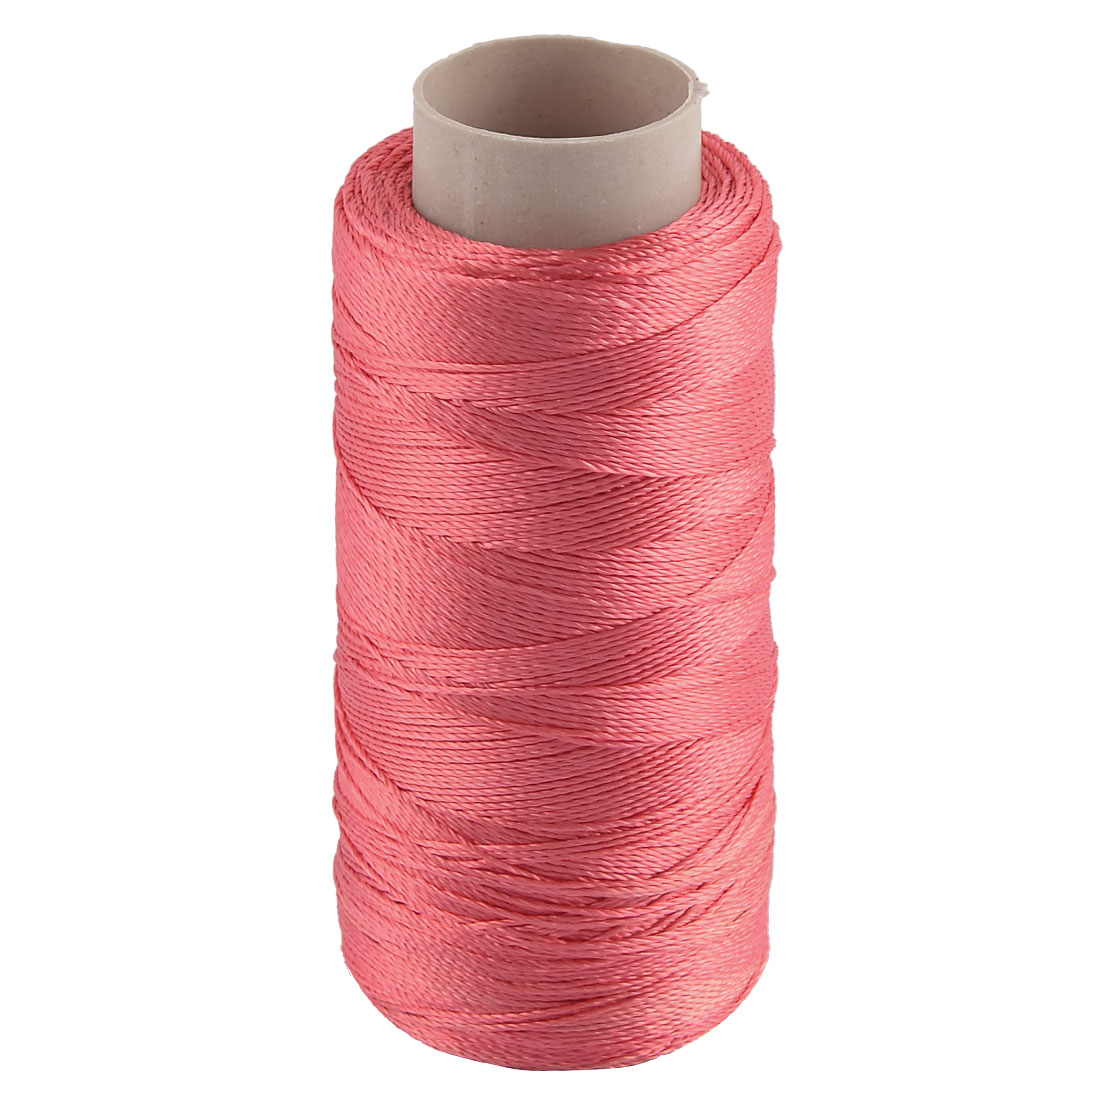 stitching machine walmart